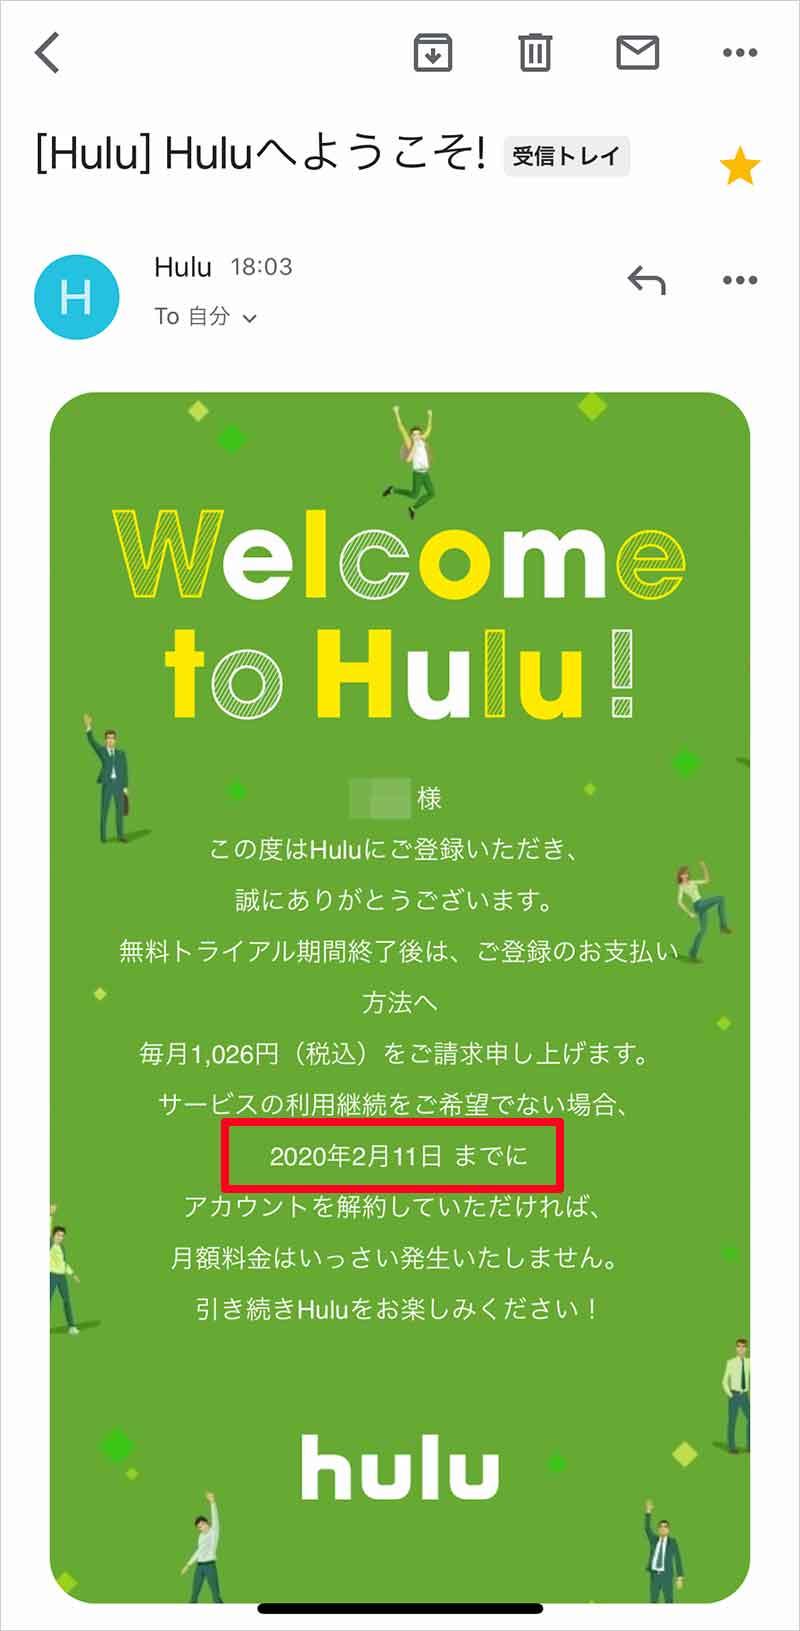 Huluの無料トライアル終了日について